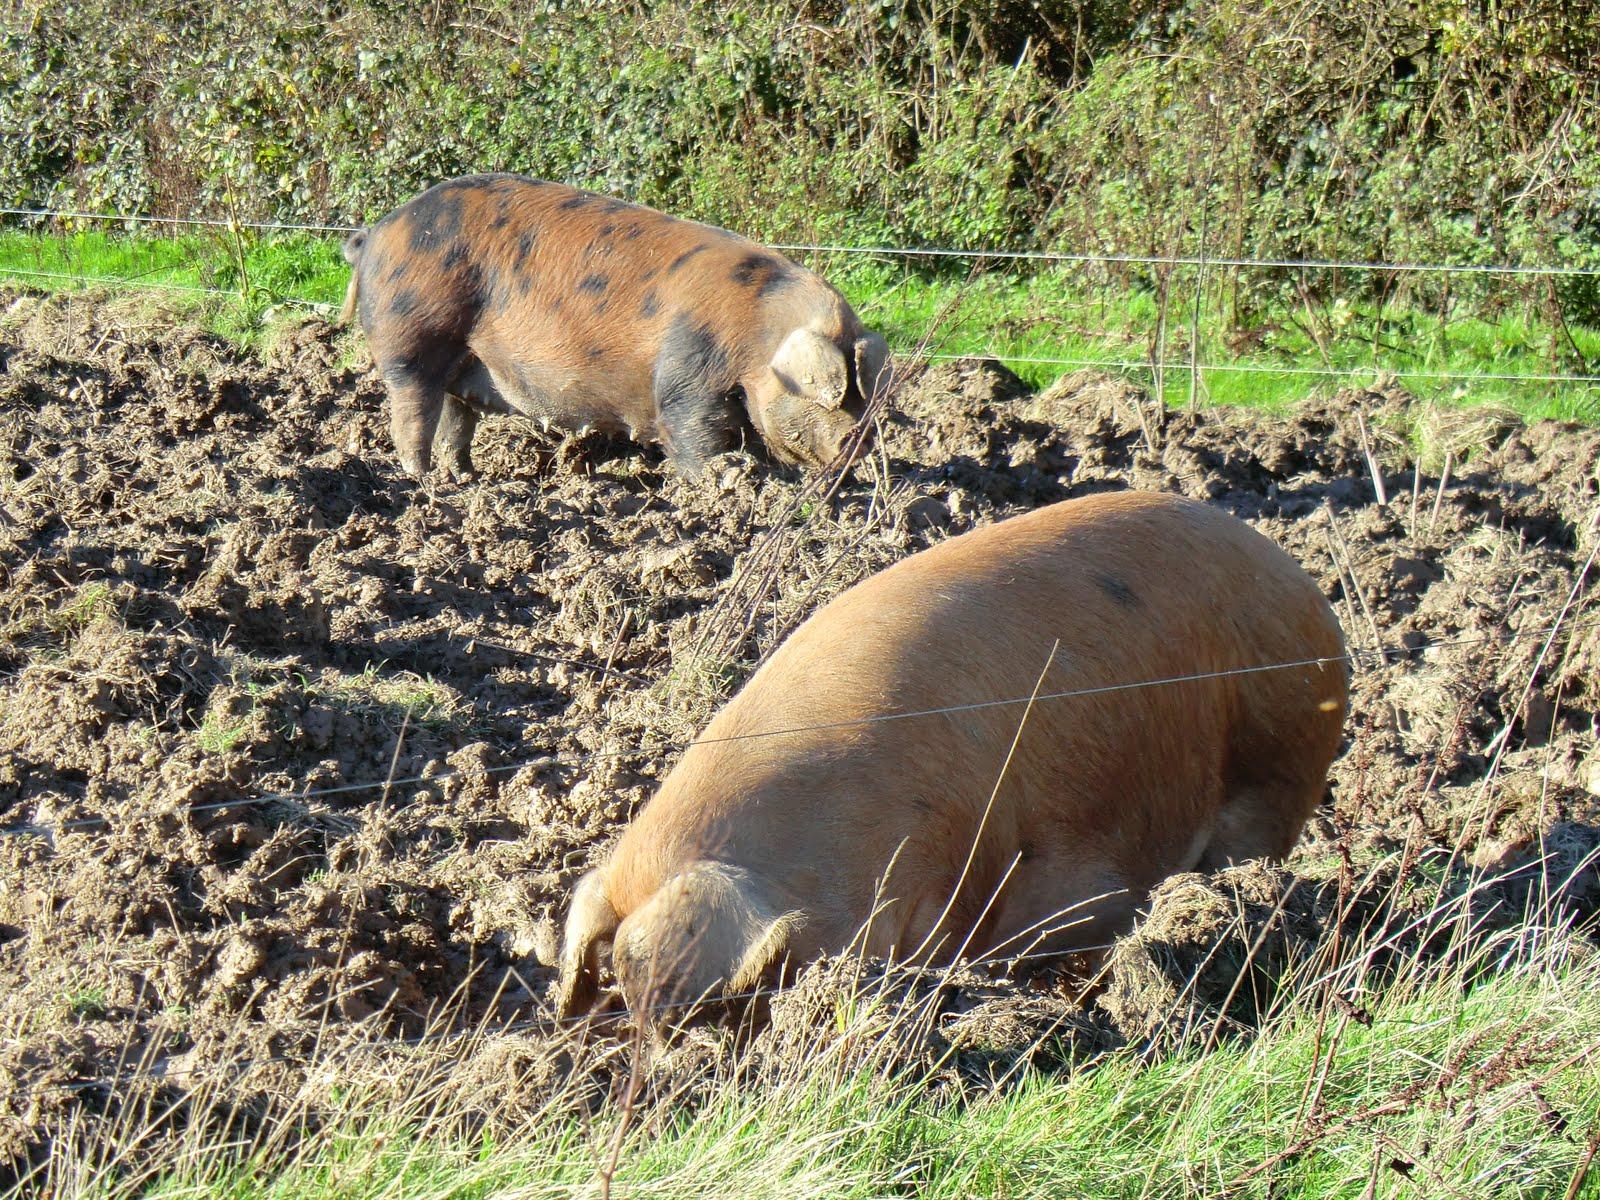 CIMG9290 Contented pigs at Tablehurst Farm